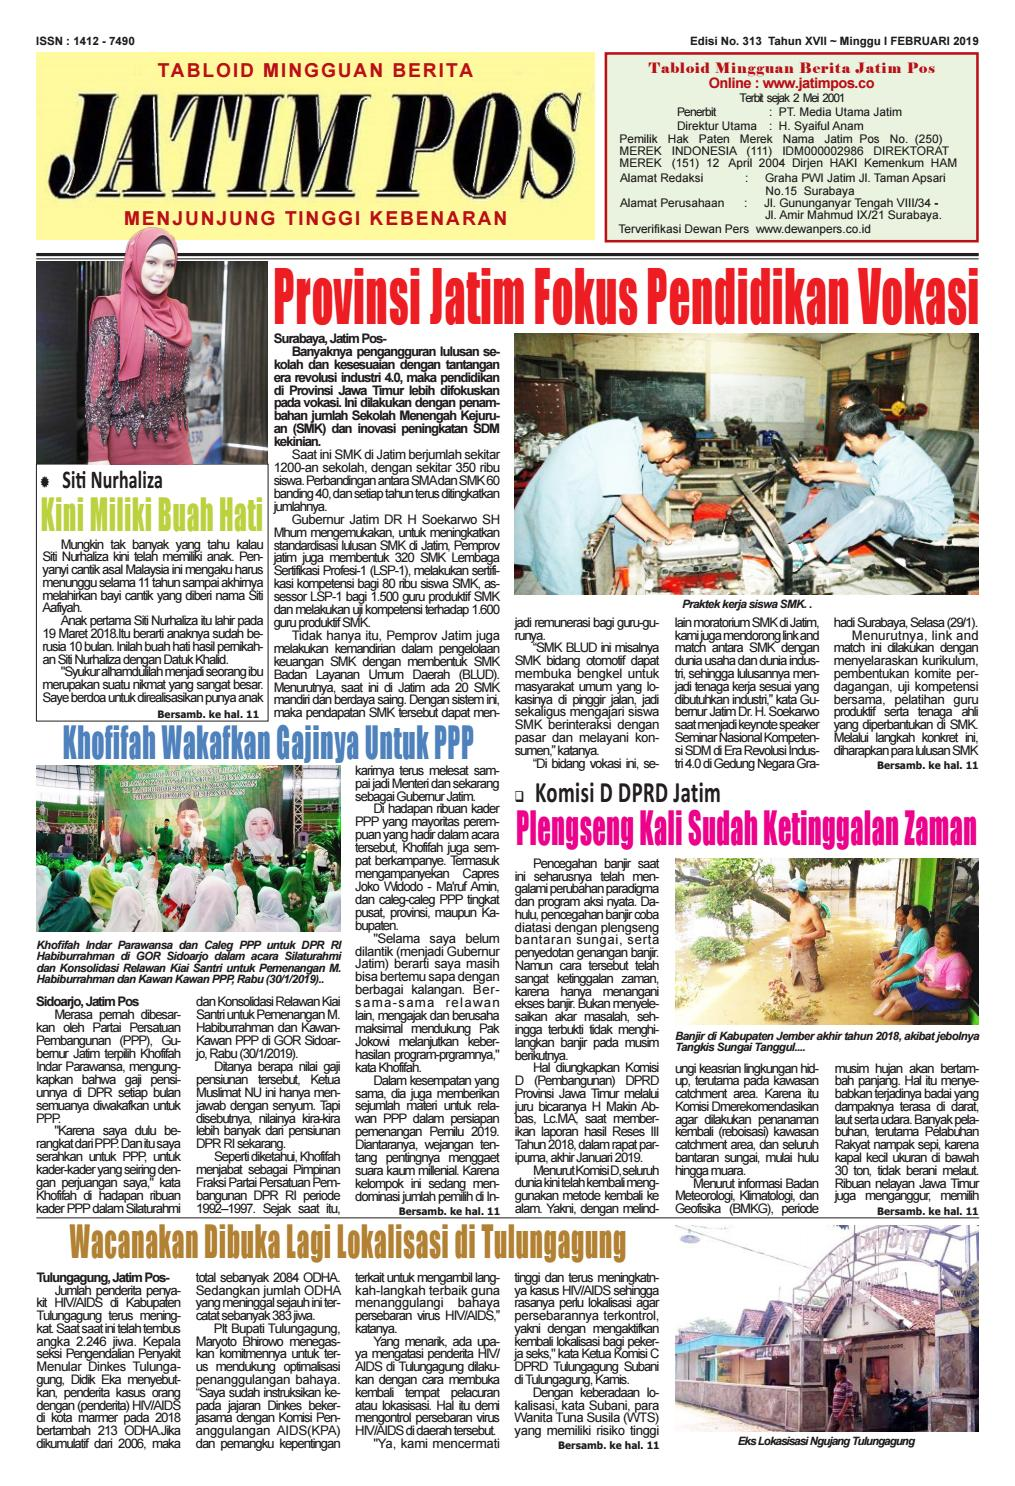 Jatim Pos Edisi No  313 by jatimpos - issuu